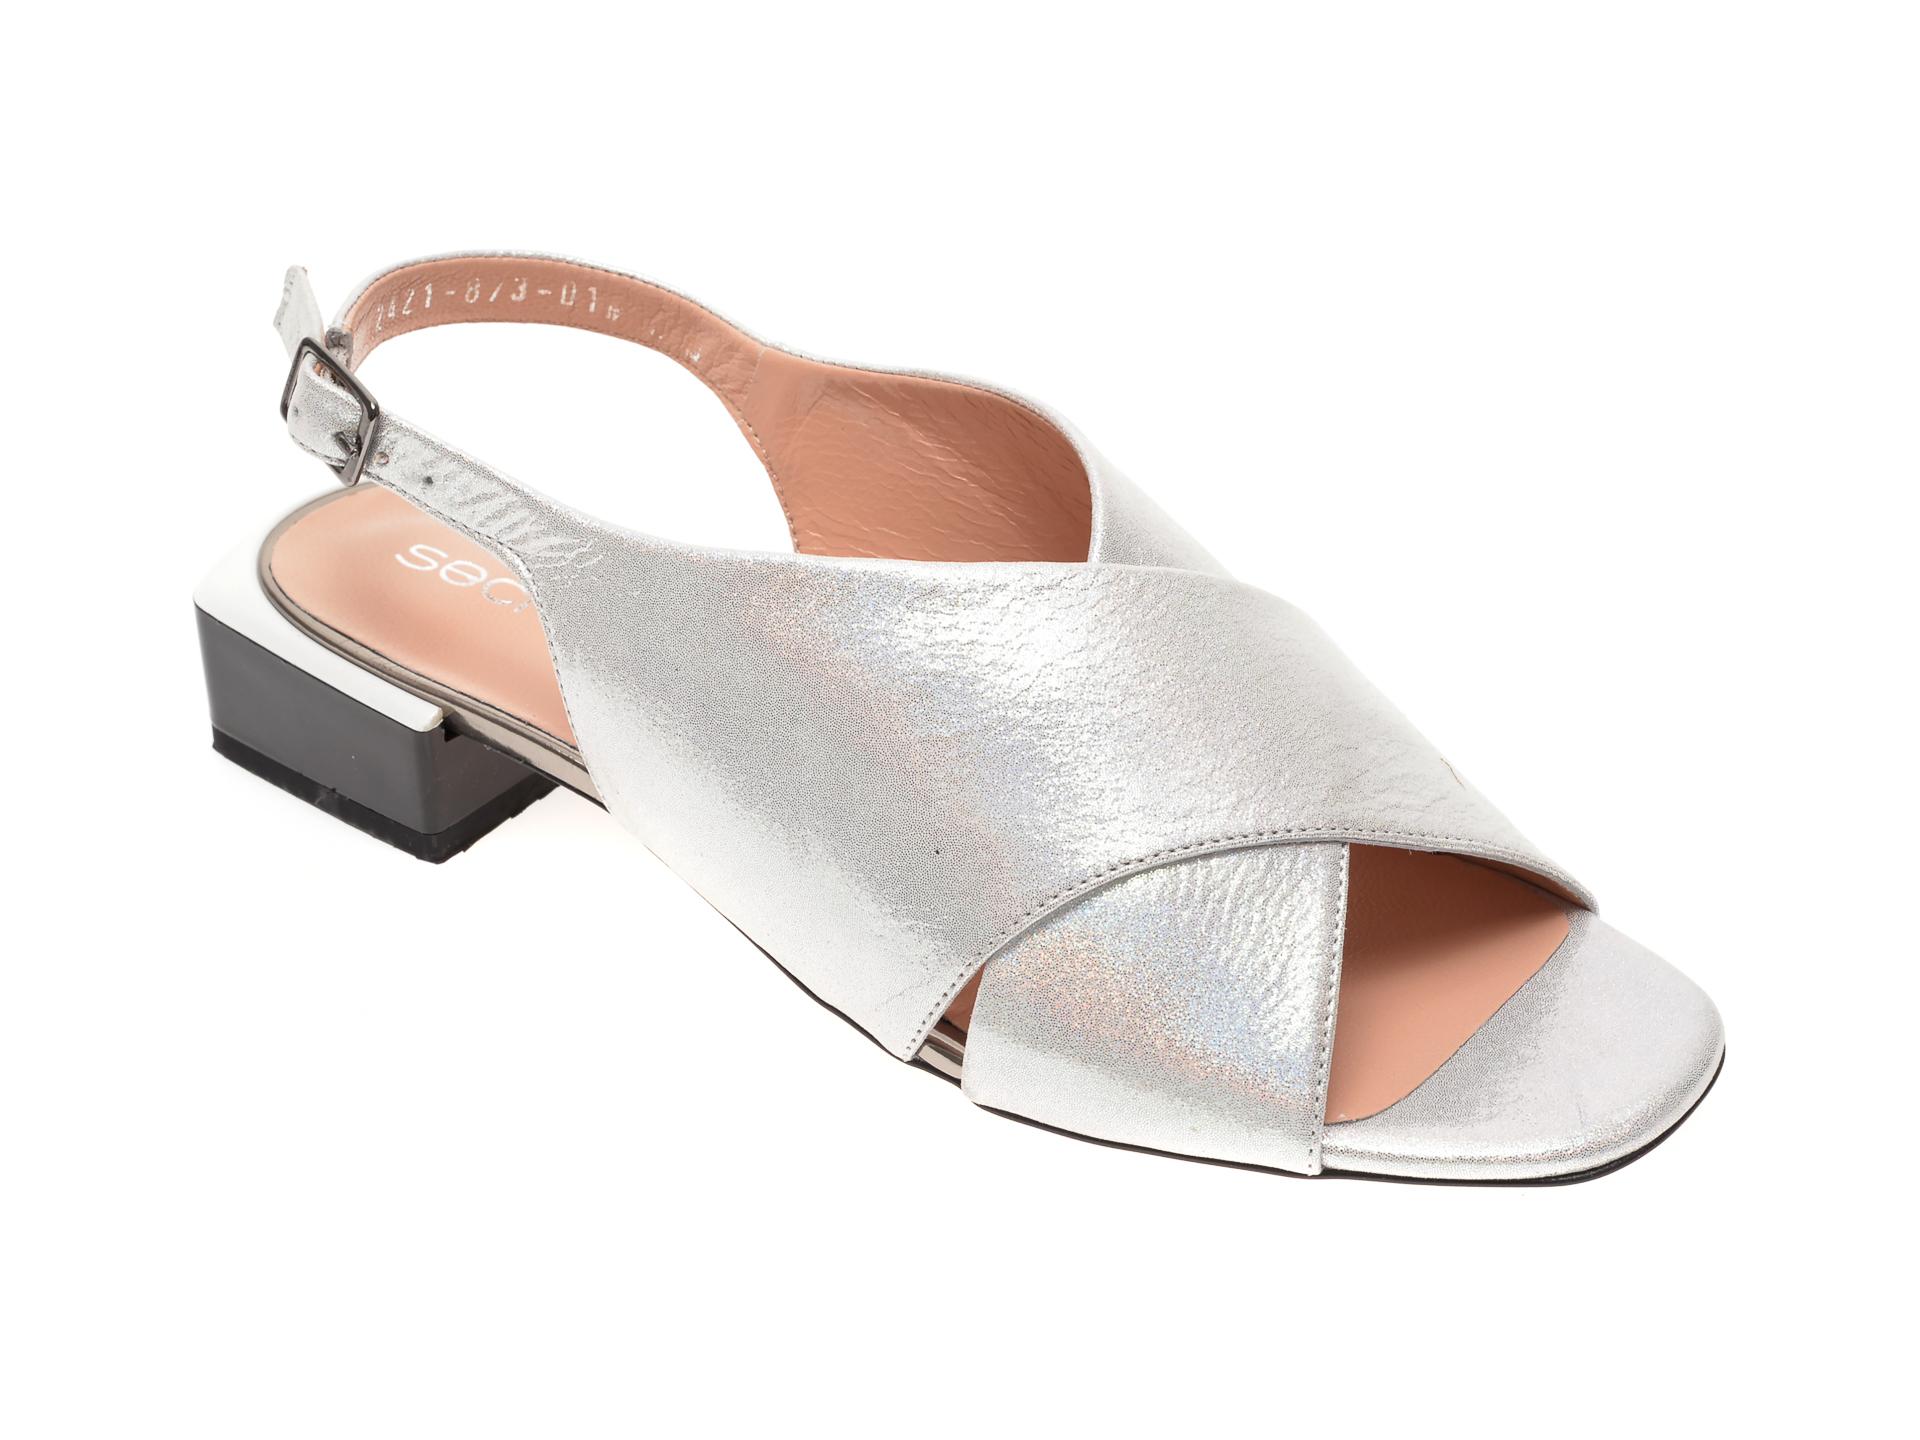 Sandale MISS LIZA argintii 1182421, din piele naturala